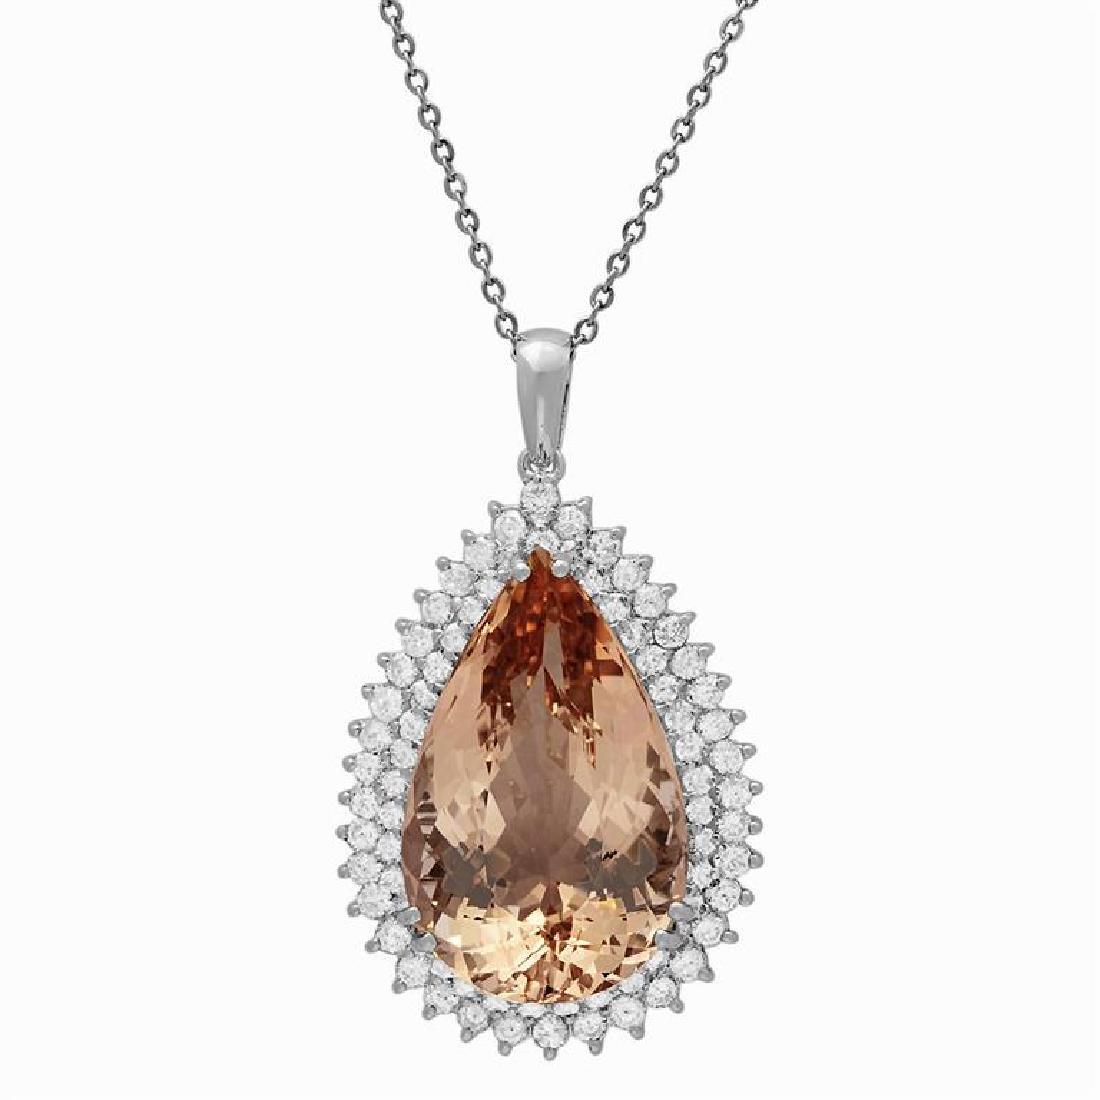 14k White Gold 43.96ct Morganite 3.86ct Diamond Pendant